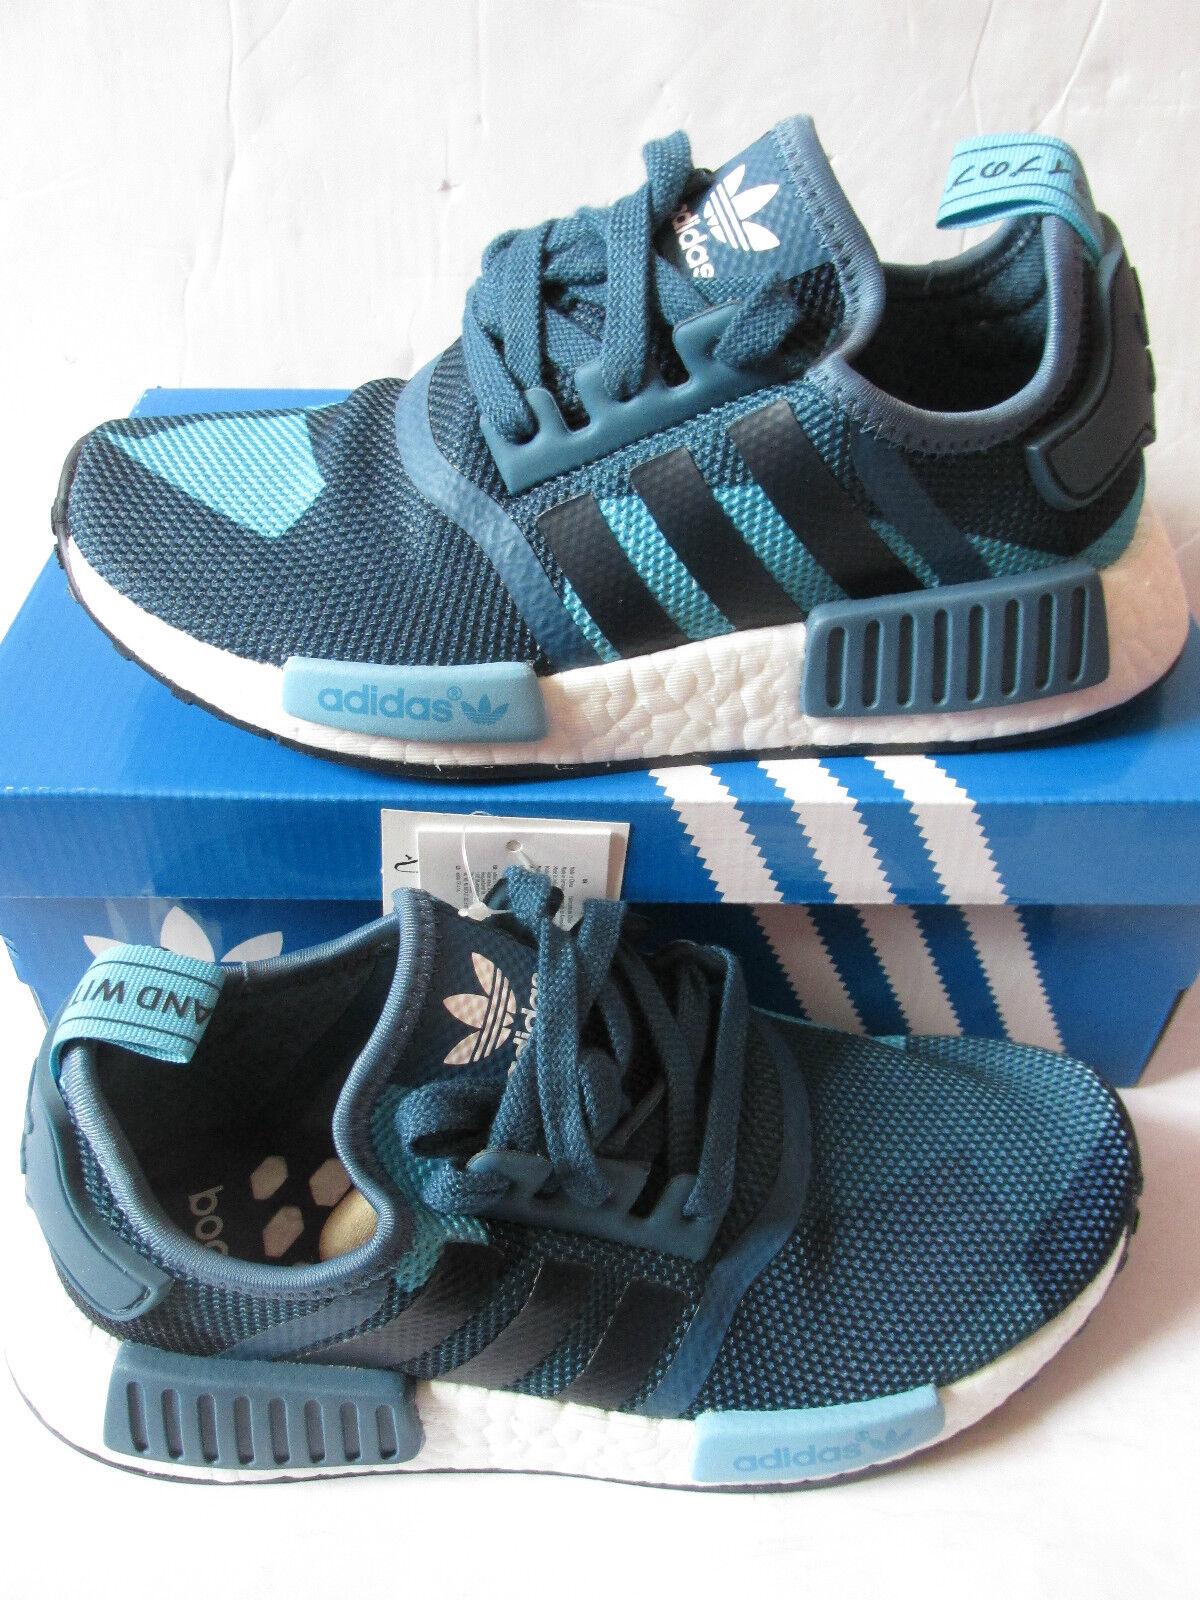 adidas originals NMD_R1   Femme  S75722 trainers Baskets   chaussures d64e1c